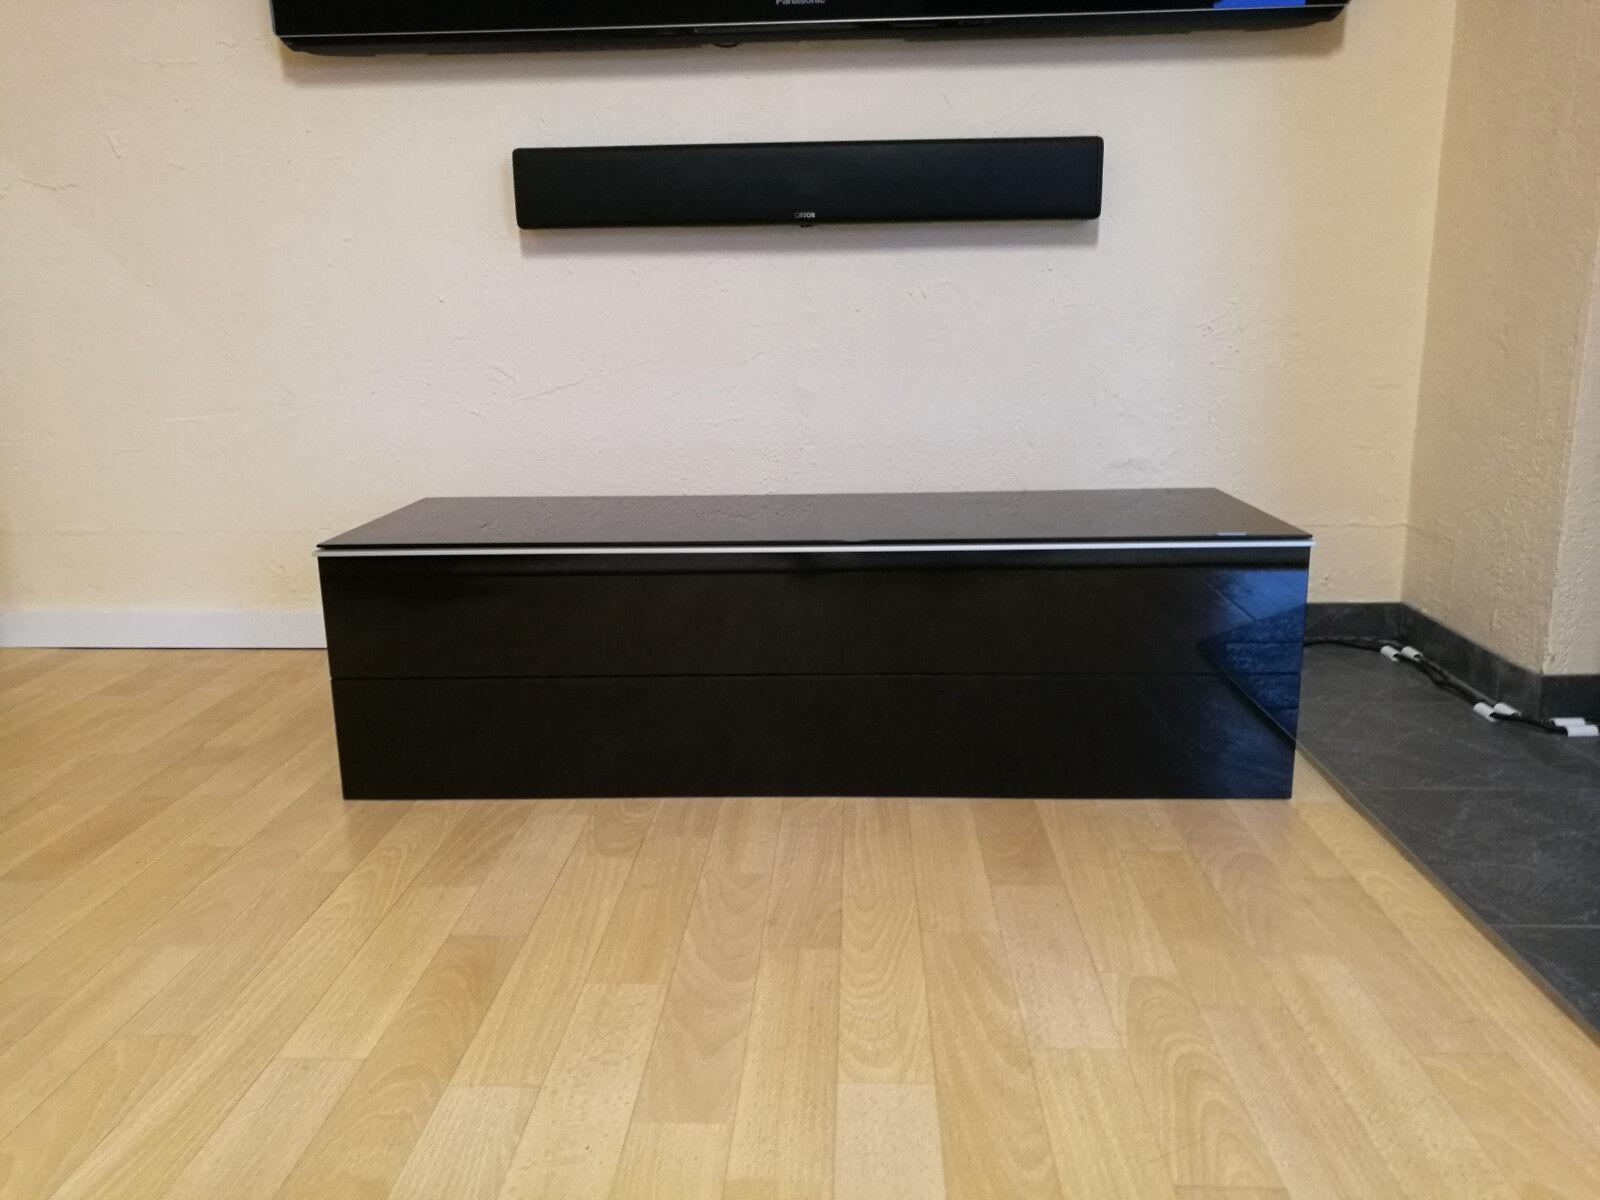 Spectral TV   Hi-Fi Board     Mediamöbel - Scala SC1100 - Wandboard - neuwertig be935a